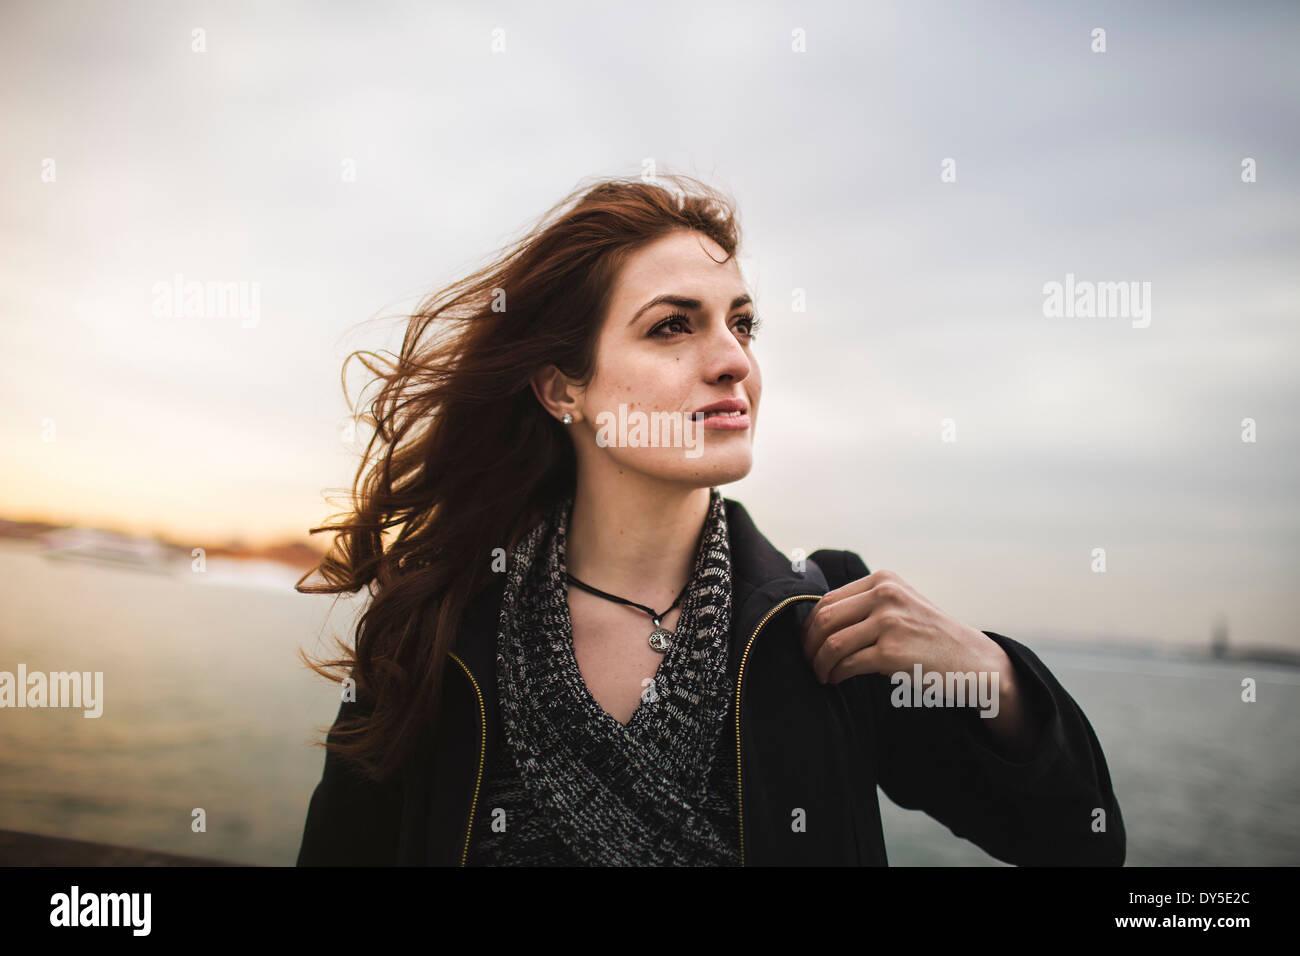 Young woman next to Hudson river, New York, USA - Stock Image